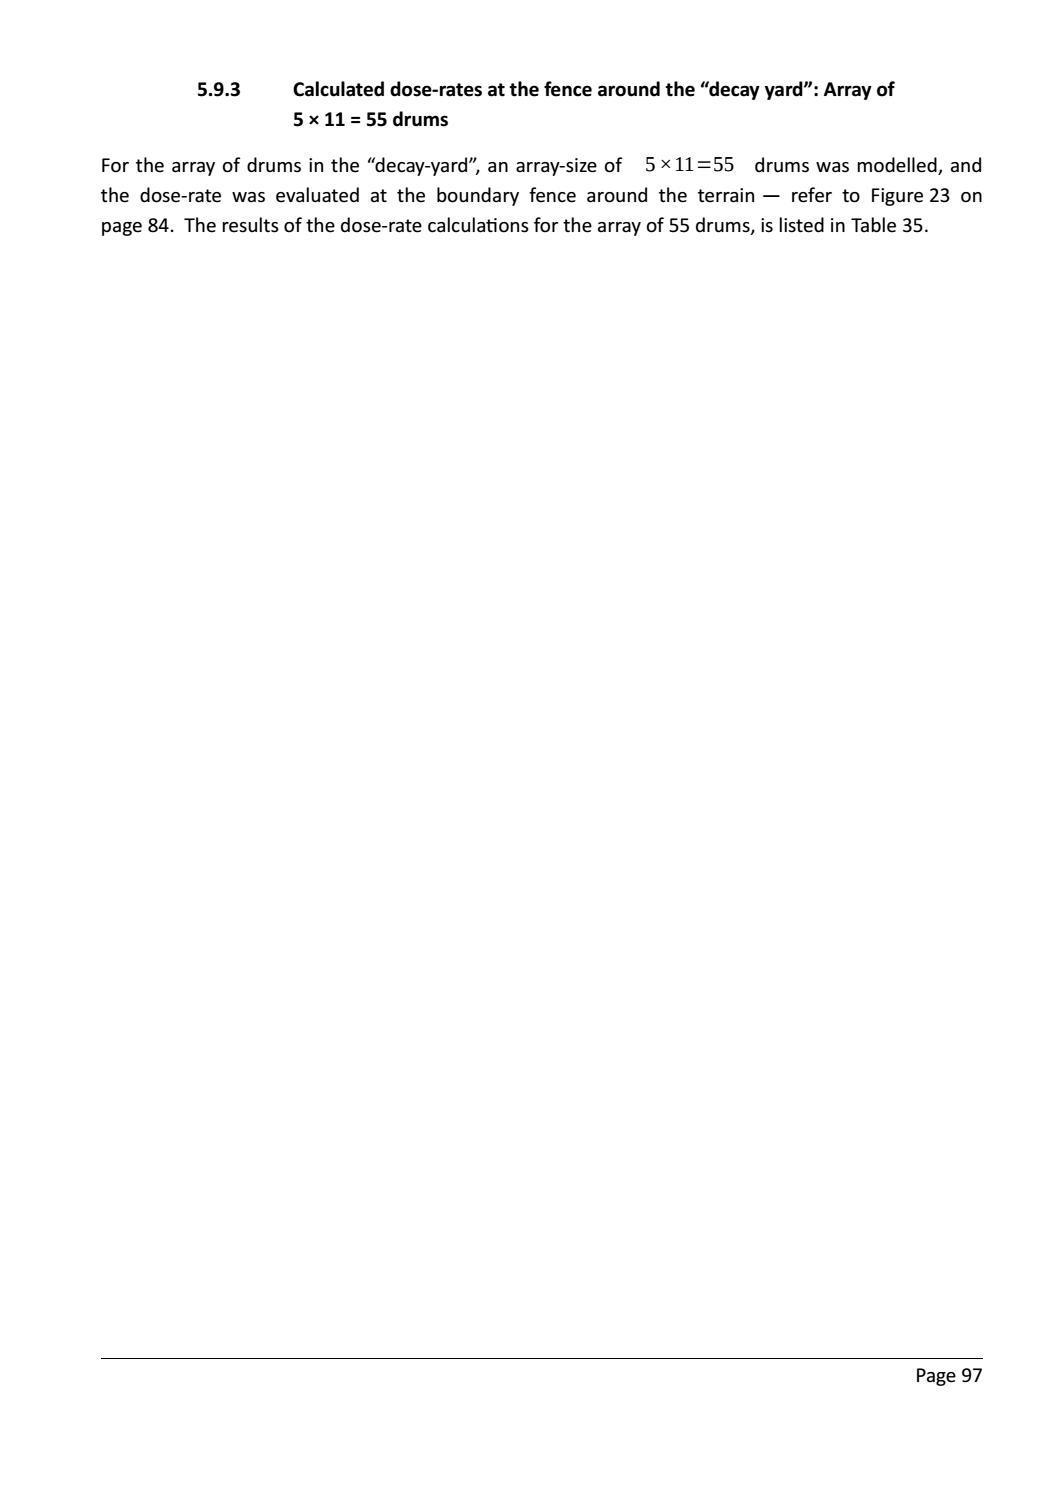 RADIOACTIVE WASTE: COMPUTATIONAL CHARACTERISATION and SHIELDING page 122